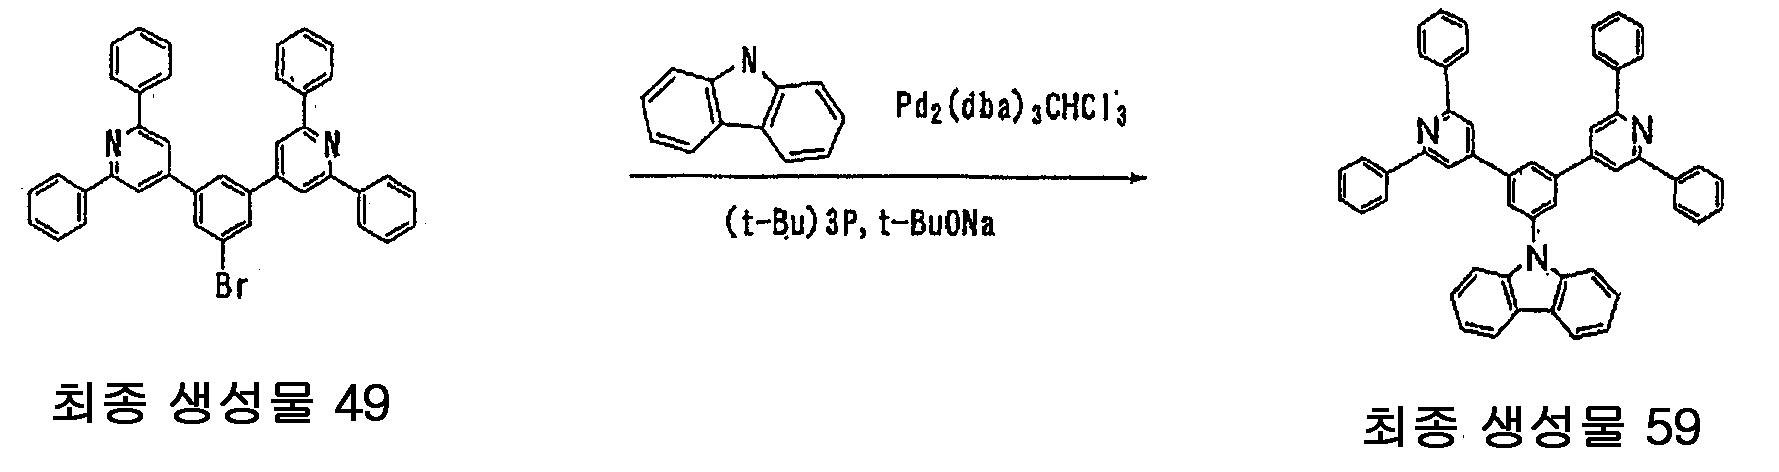 Figure 112010002231902-pat00147